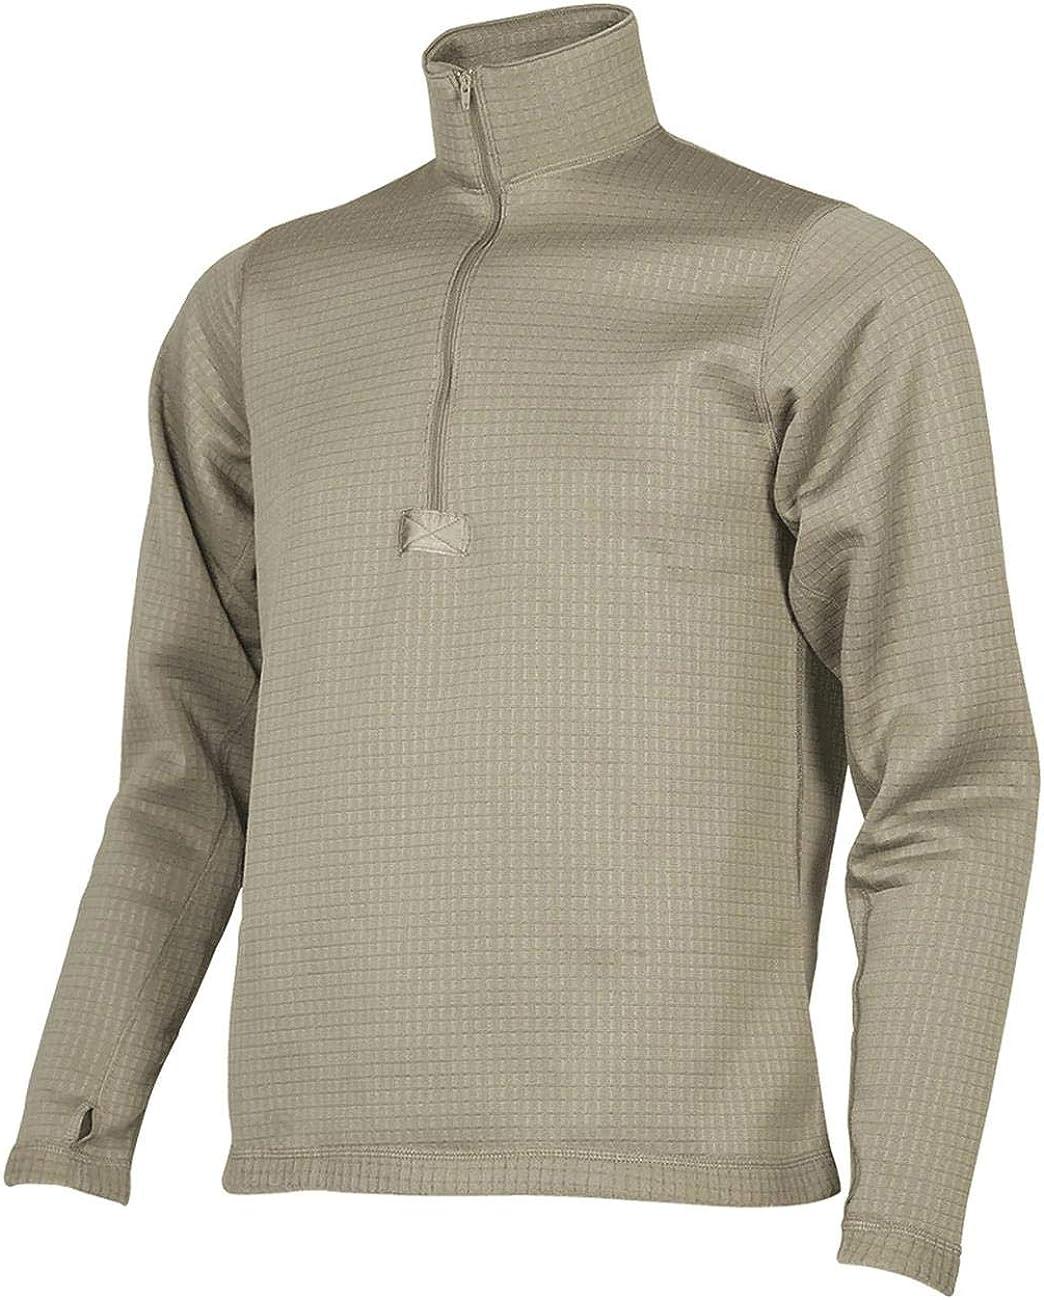 ECWCS Gen III Level 2 Thermal Grid Fleece Shirt, Made in USA